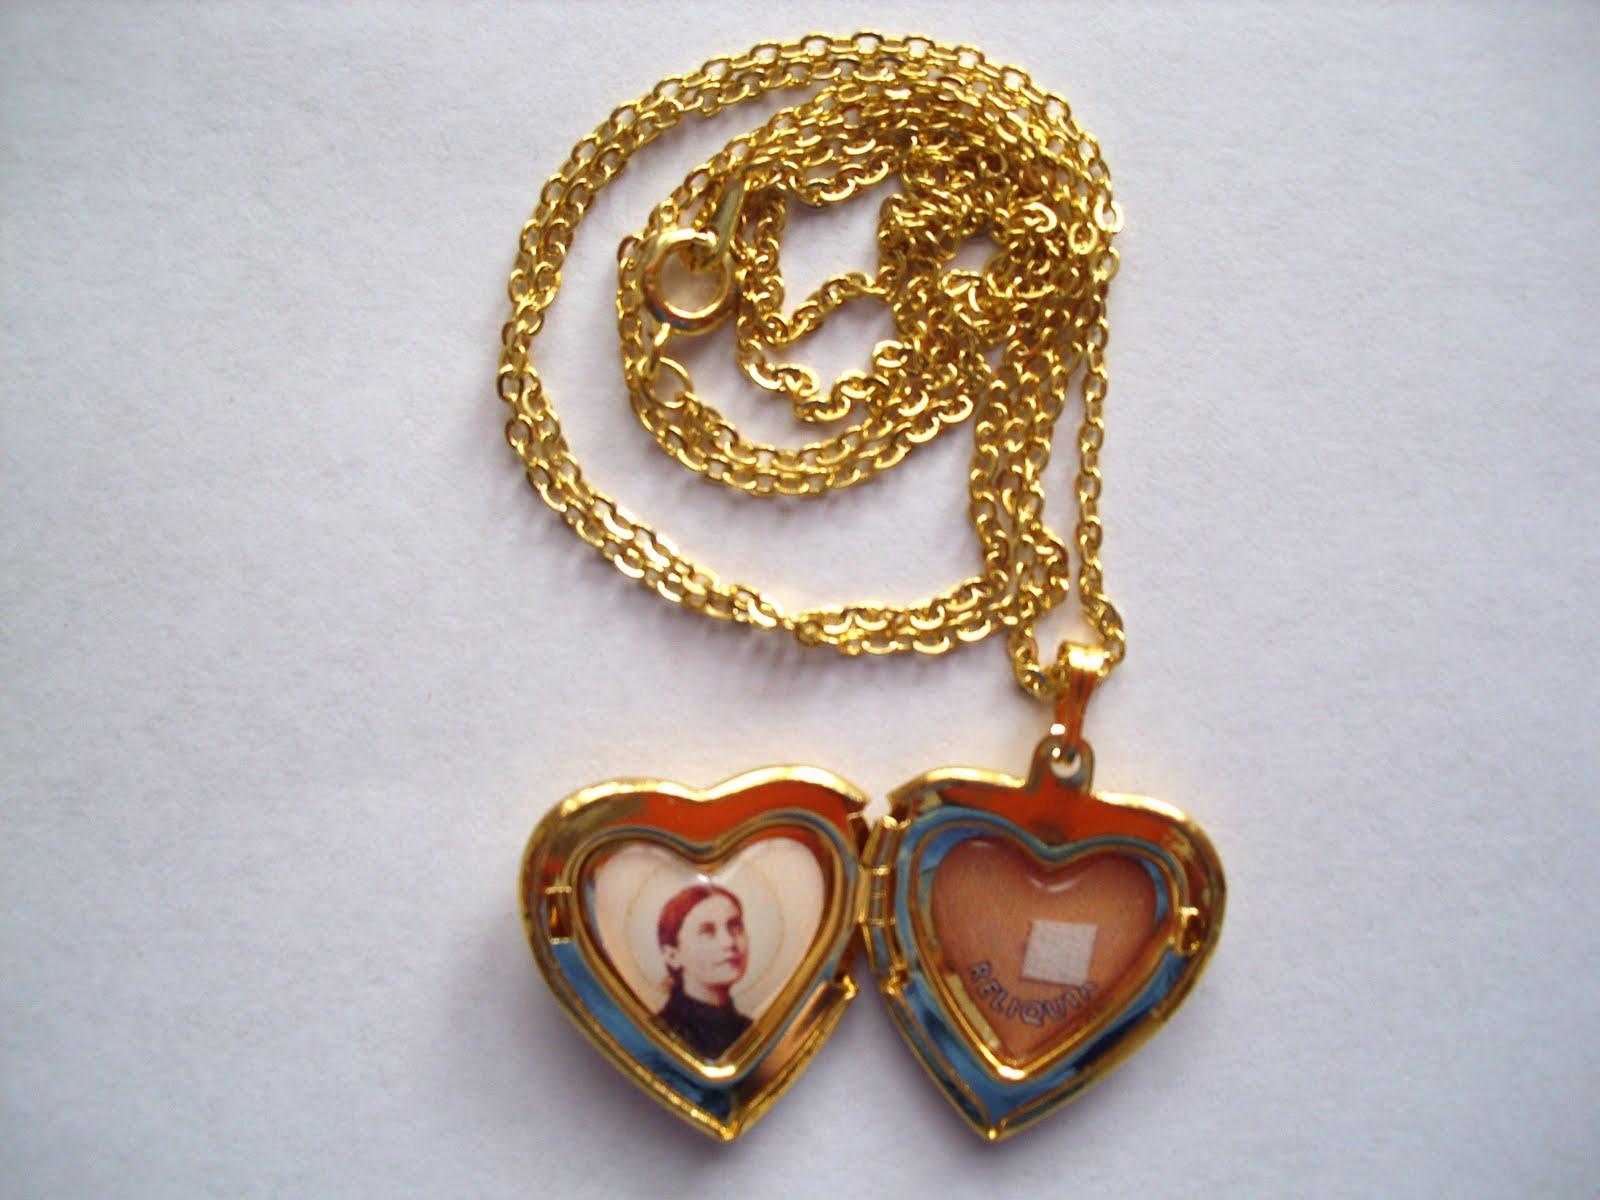 http://2.bp.blogspot.com/-sO86fUmrn8o/TYOoZtTmlzI/AAAAAAAAC34/GAp9UKTO78c/s1600/St-Gemma-Necklace-1.jpg